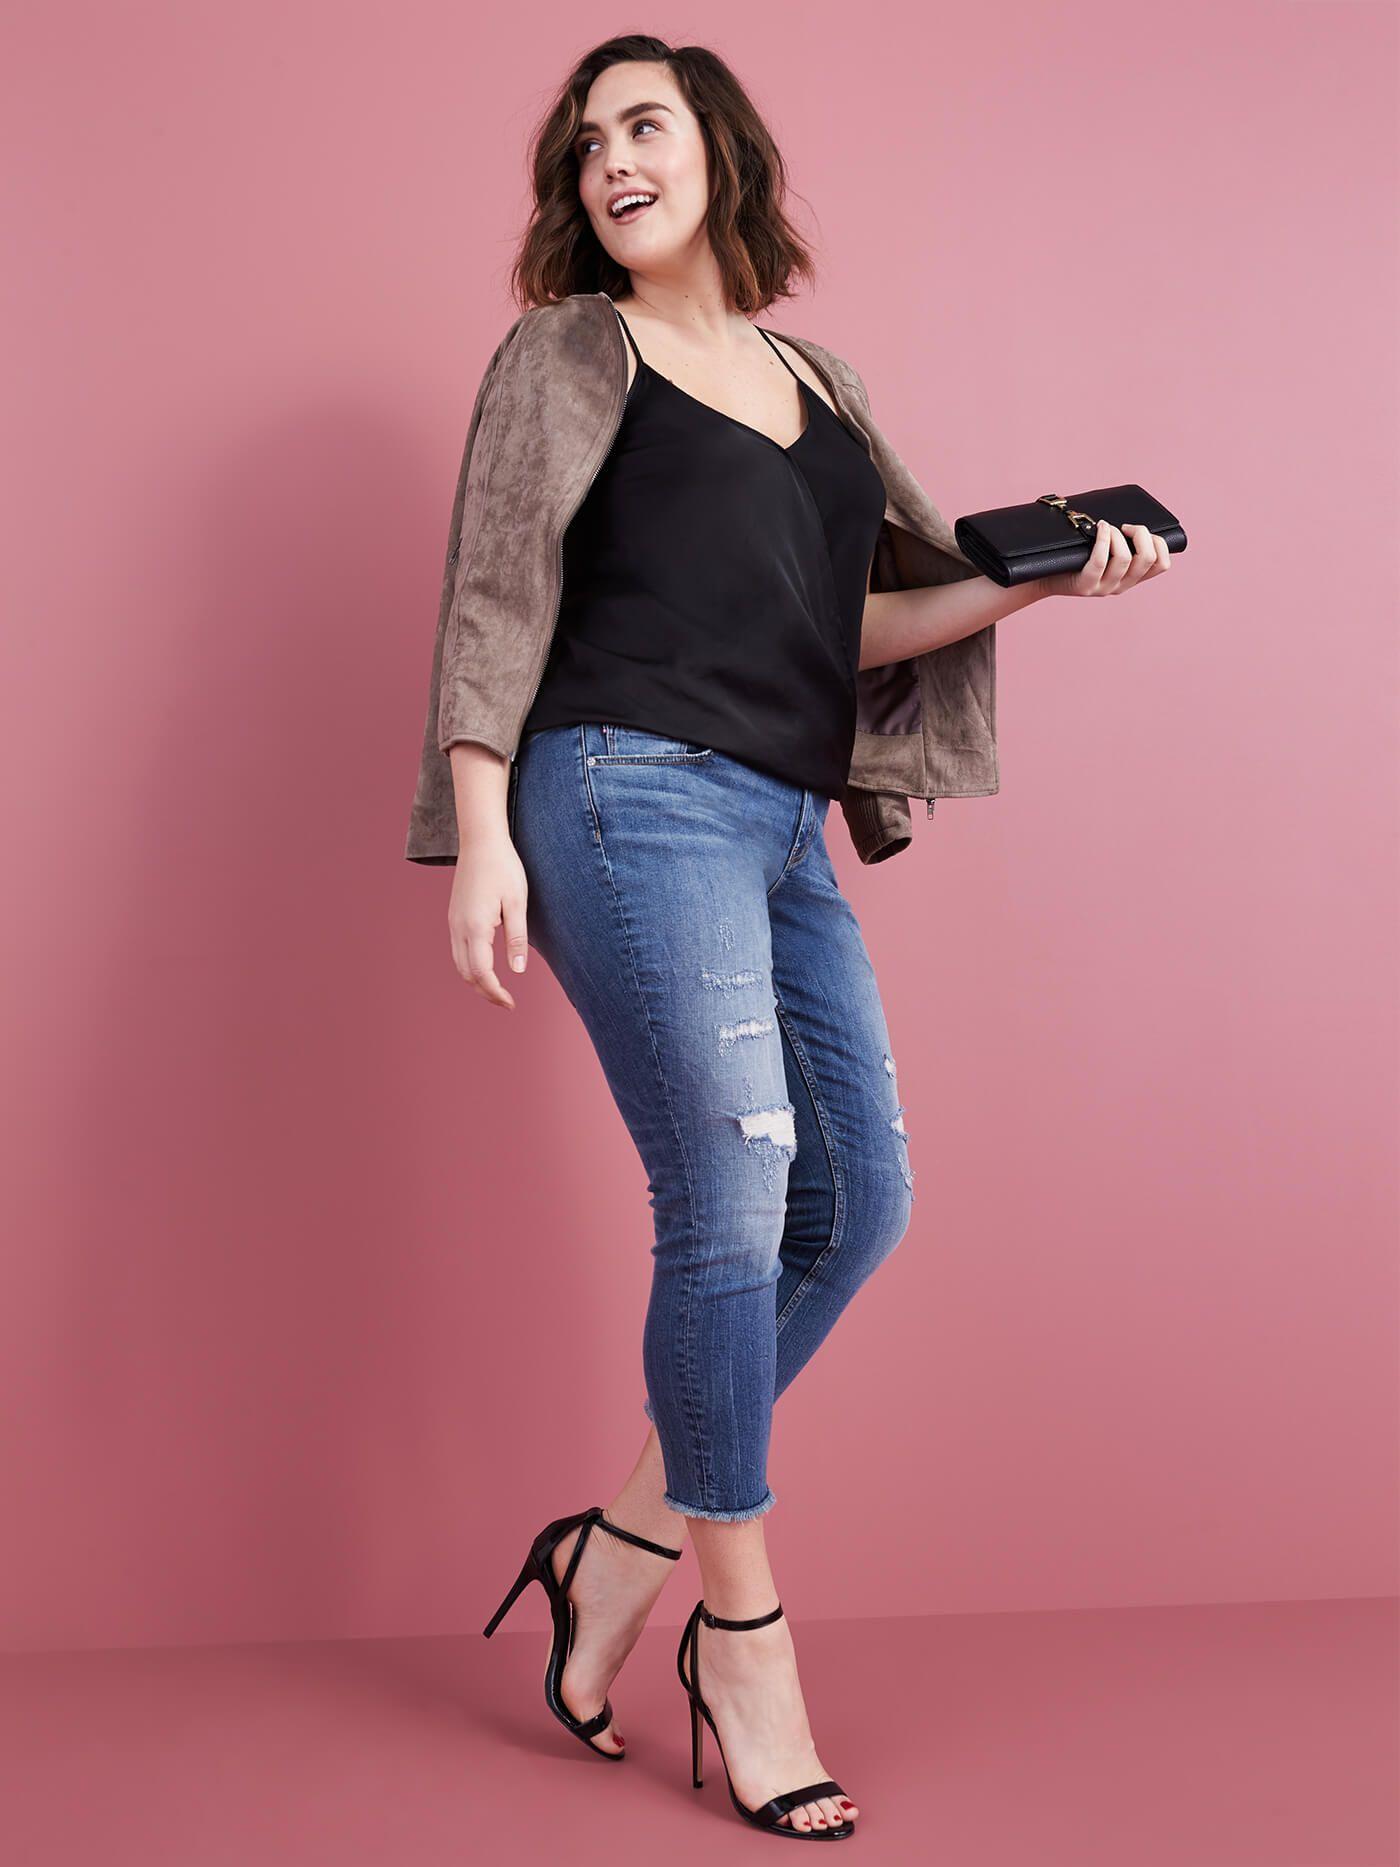 Tipsclass Fashion to night out peplum dress photos